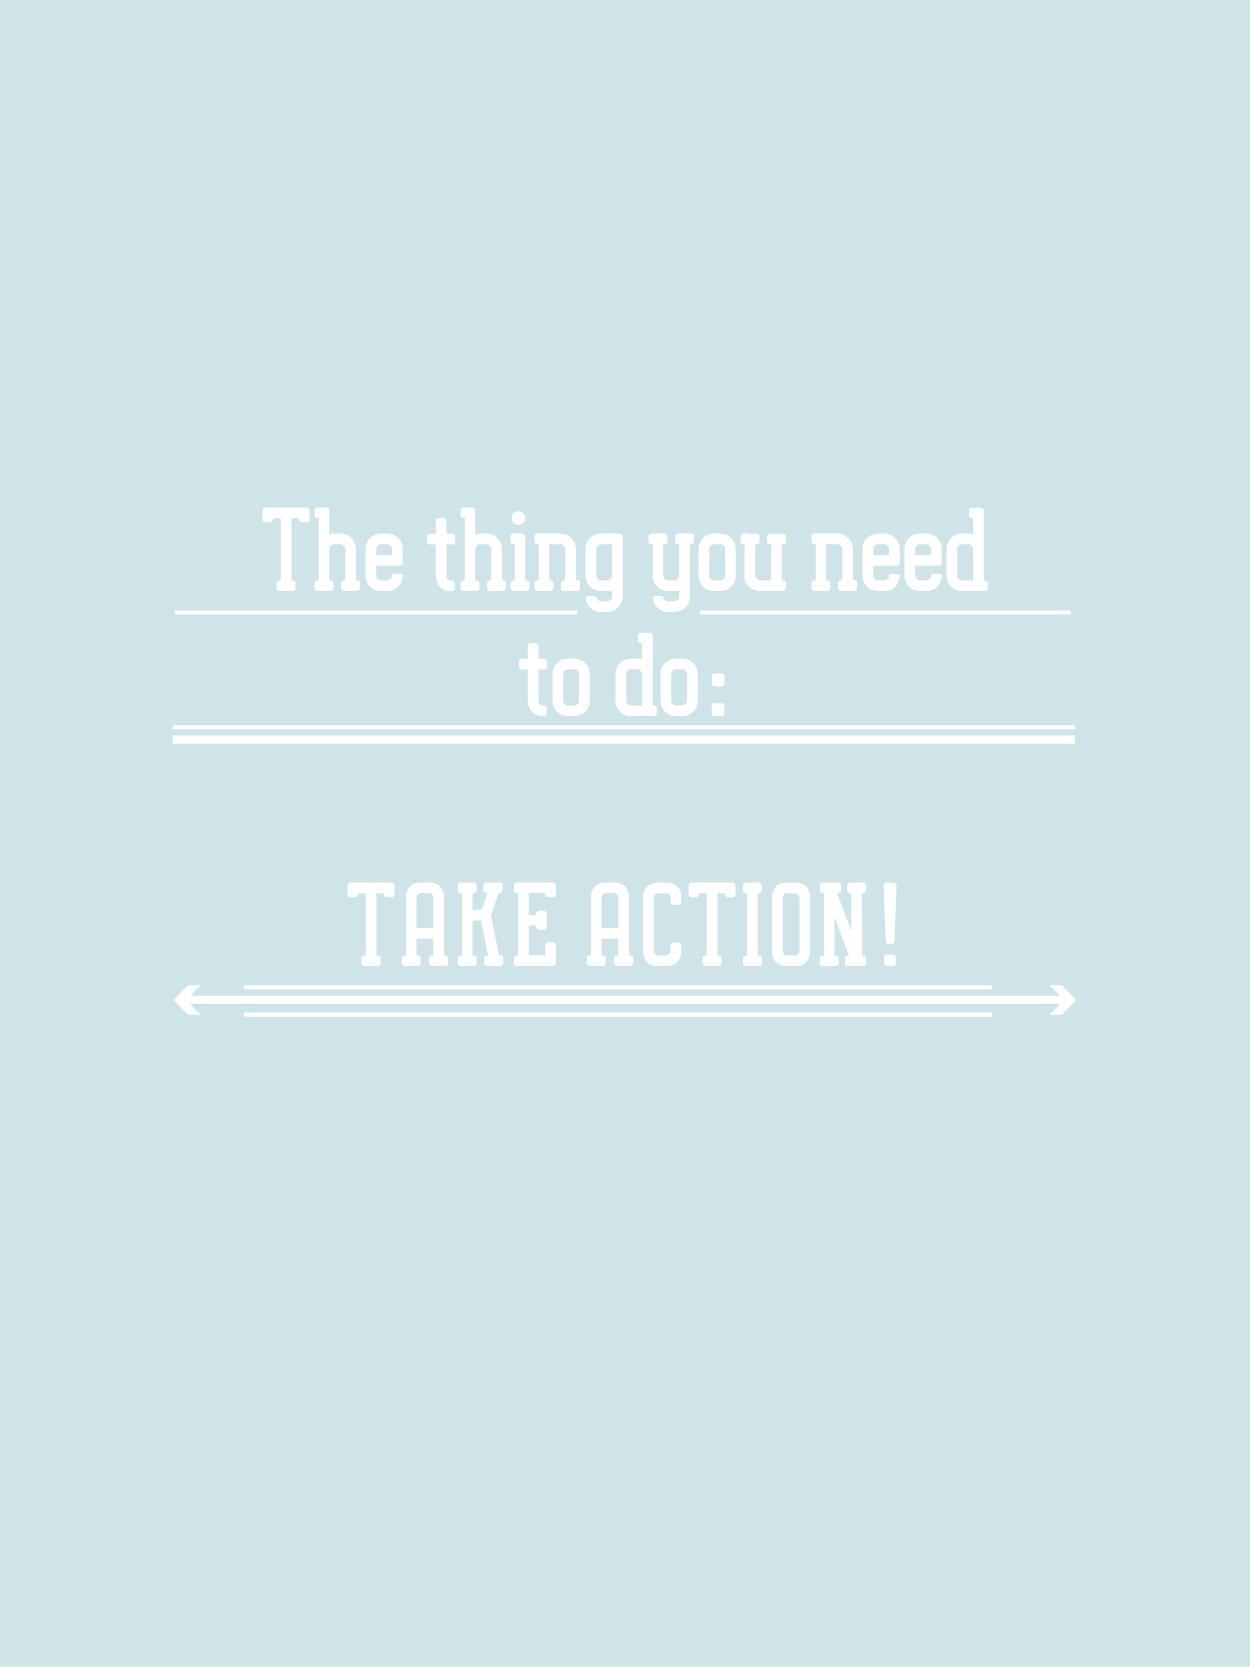 the BIZ school for creatives; You must take action! read the full blog post at www.kerstinpressler.com/blog